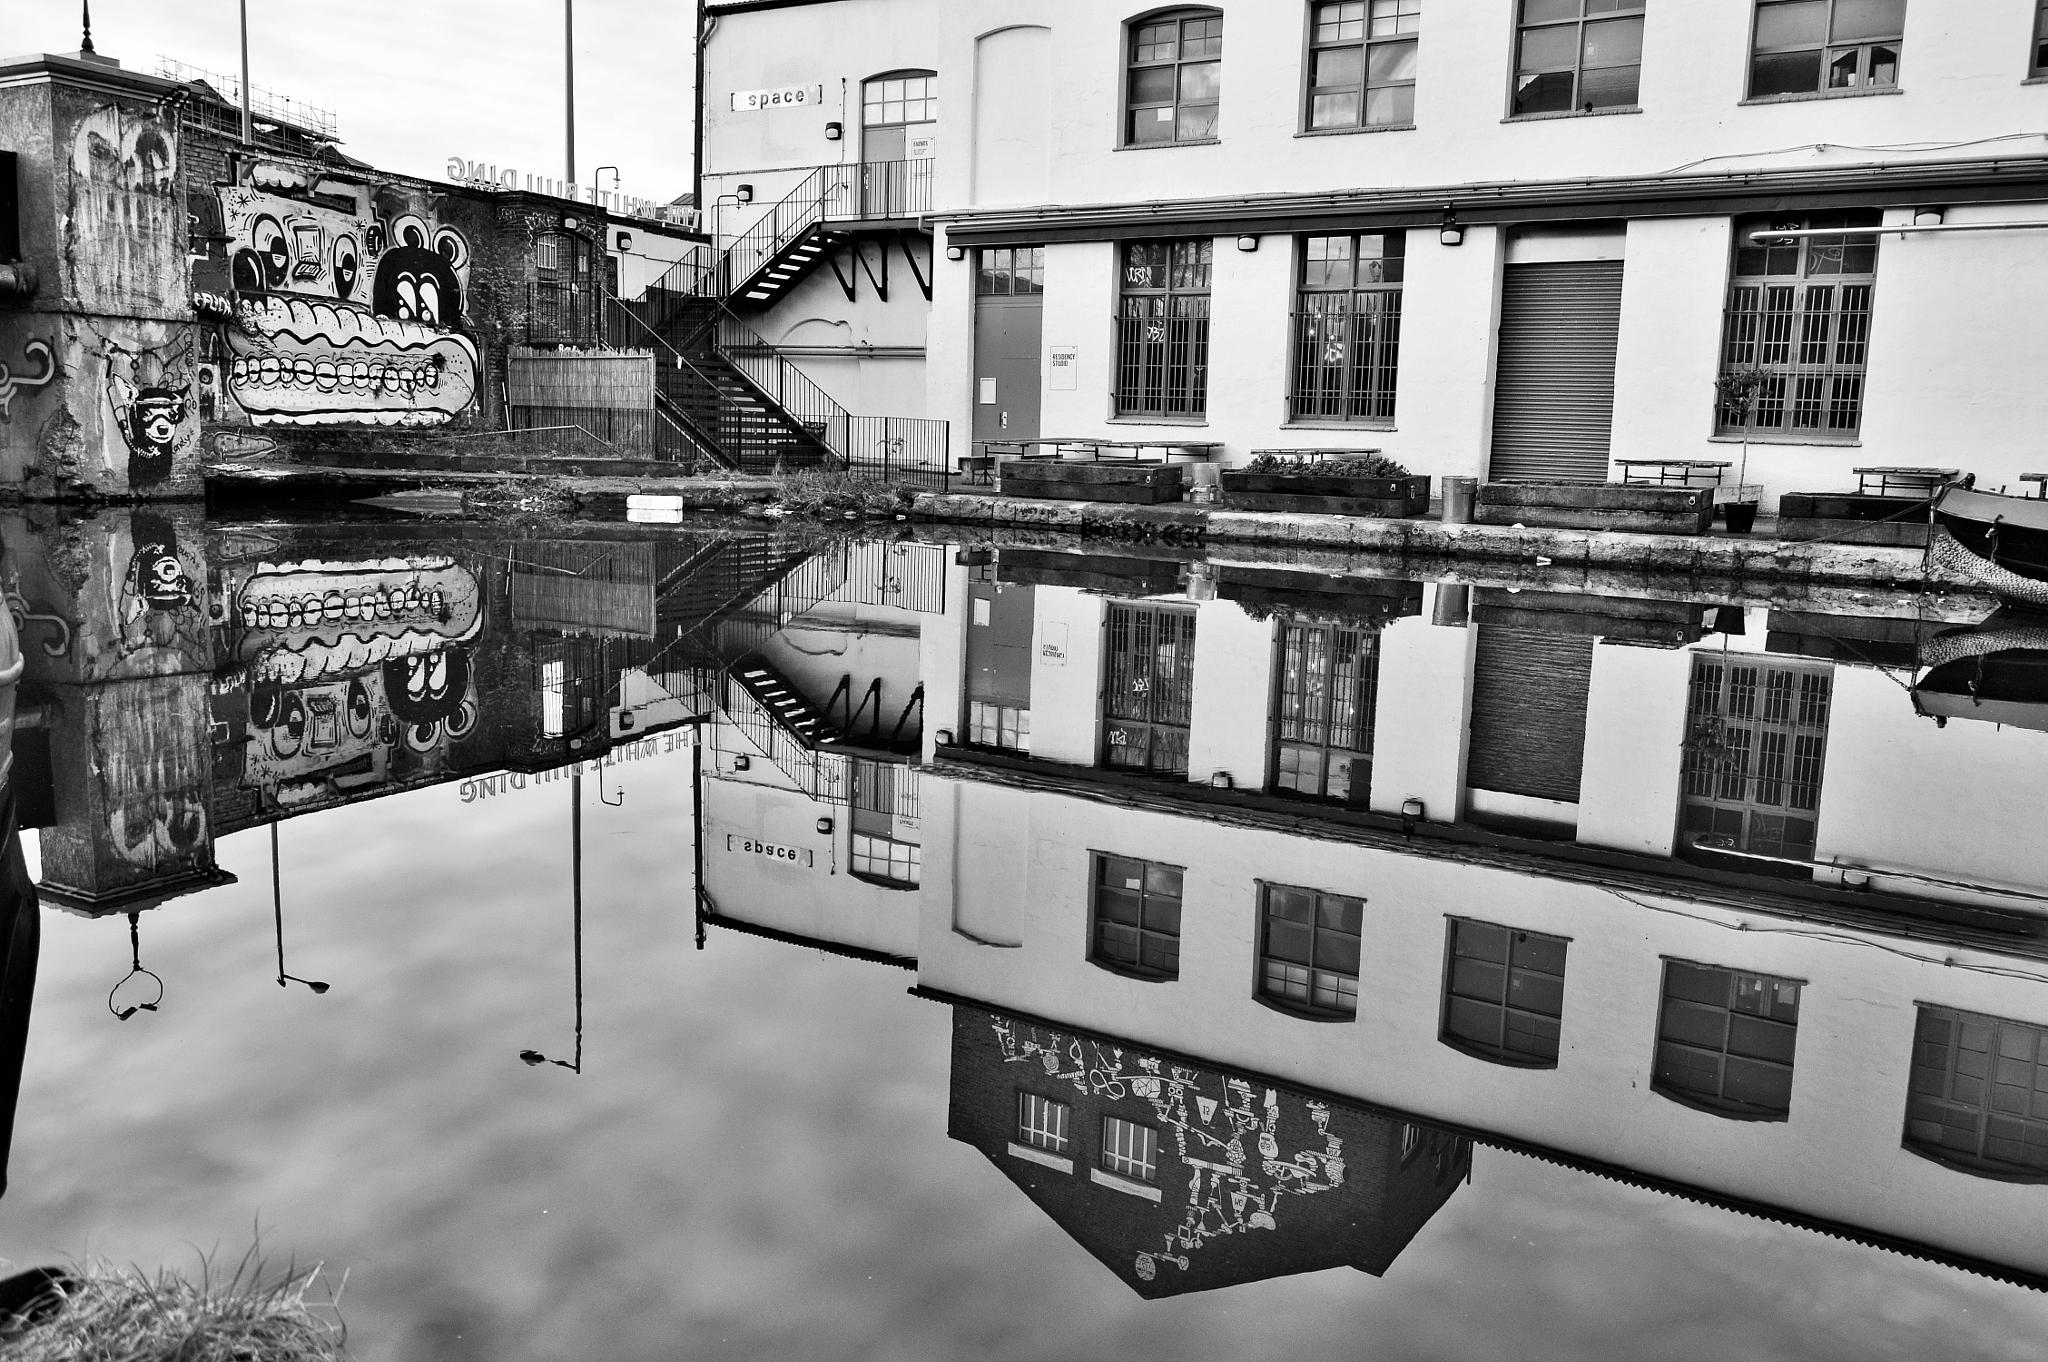 Hackney Wick reflections by maxsand68